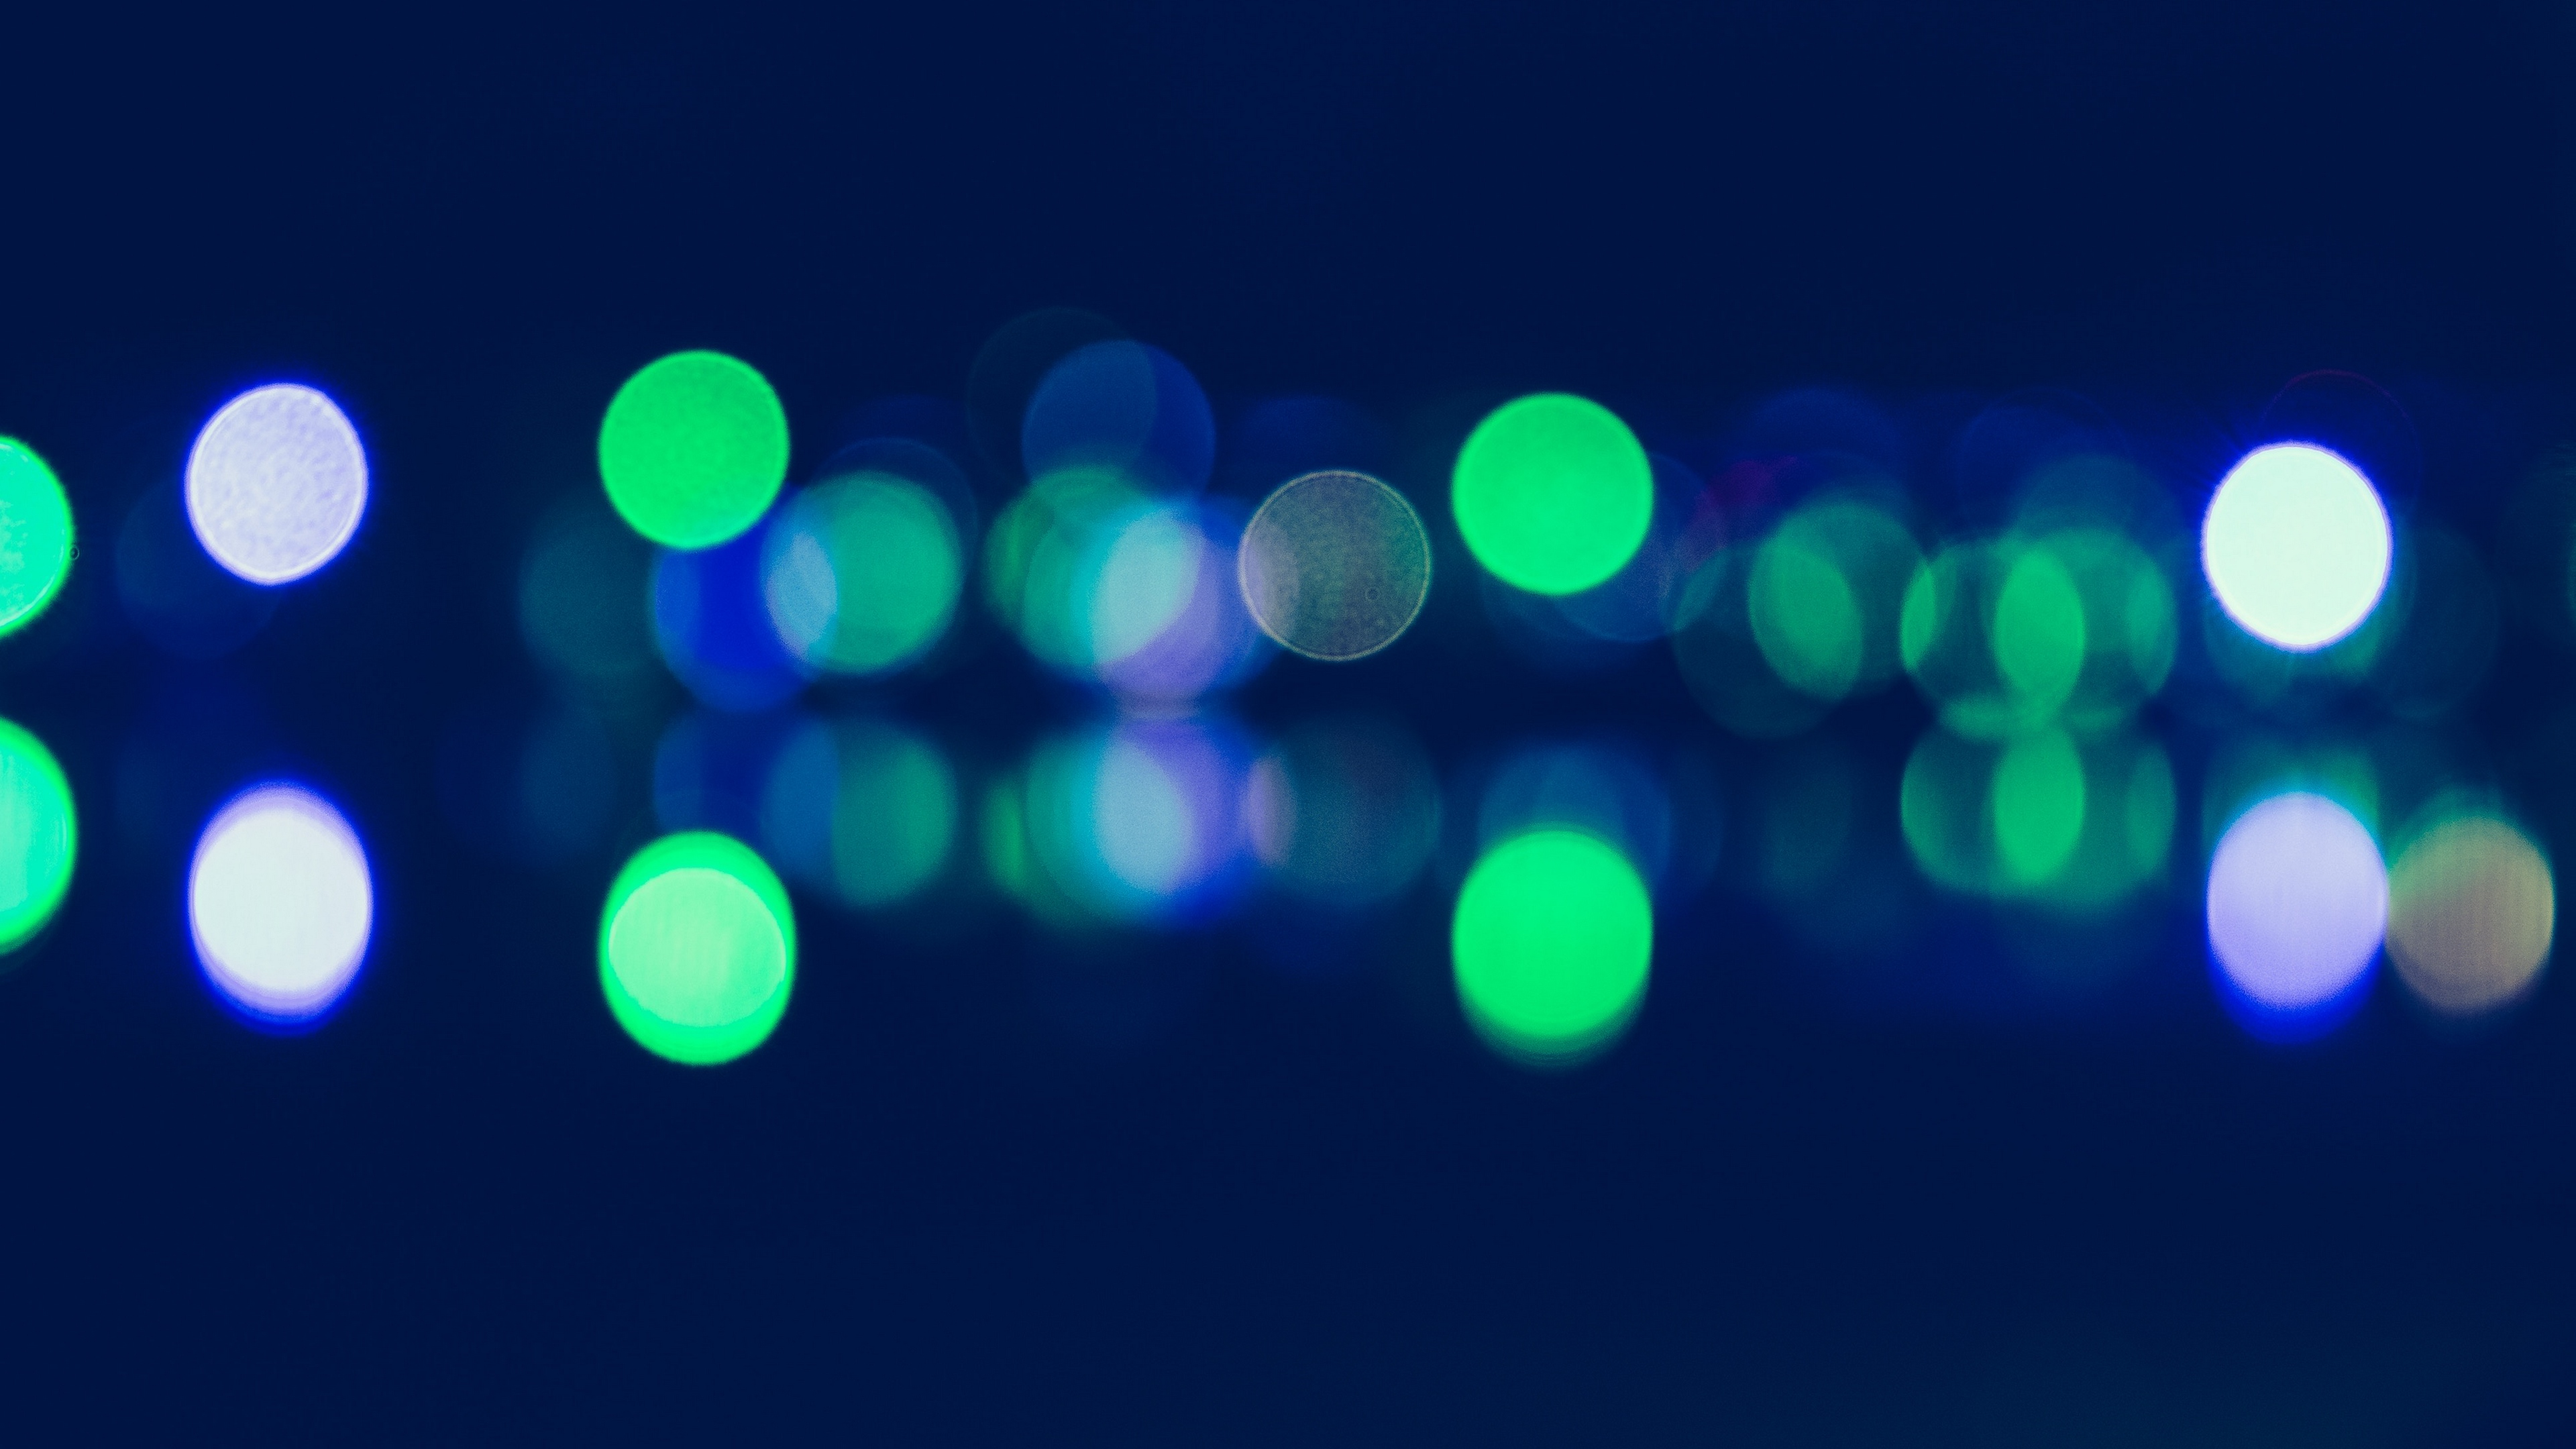 highlights green blue 4k 1539369980 - highlights, green, blue 4k - highlights, green, blue